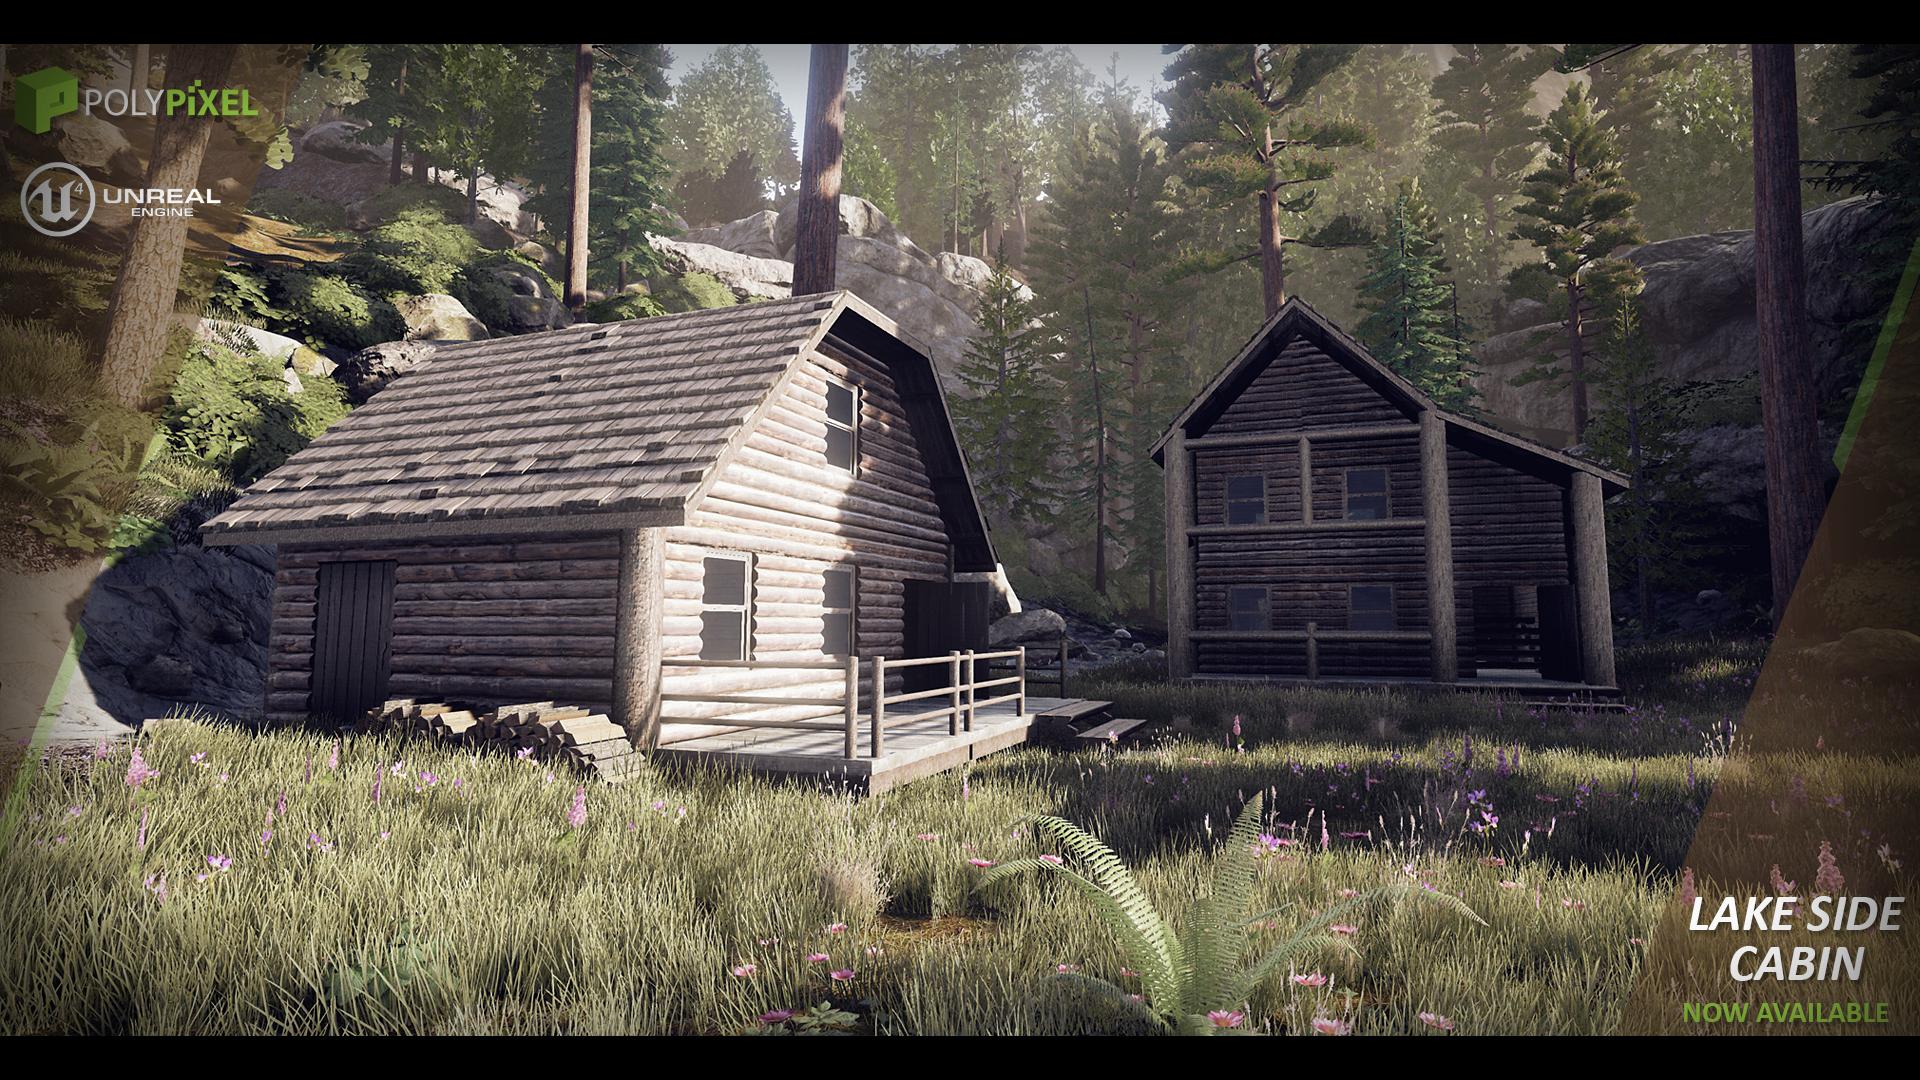 Lake Side Cabin